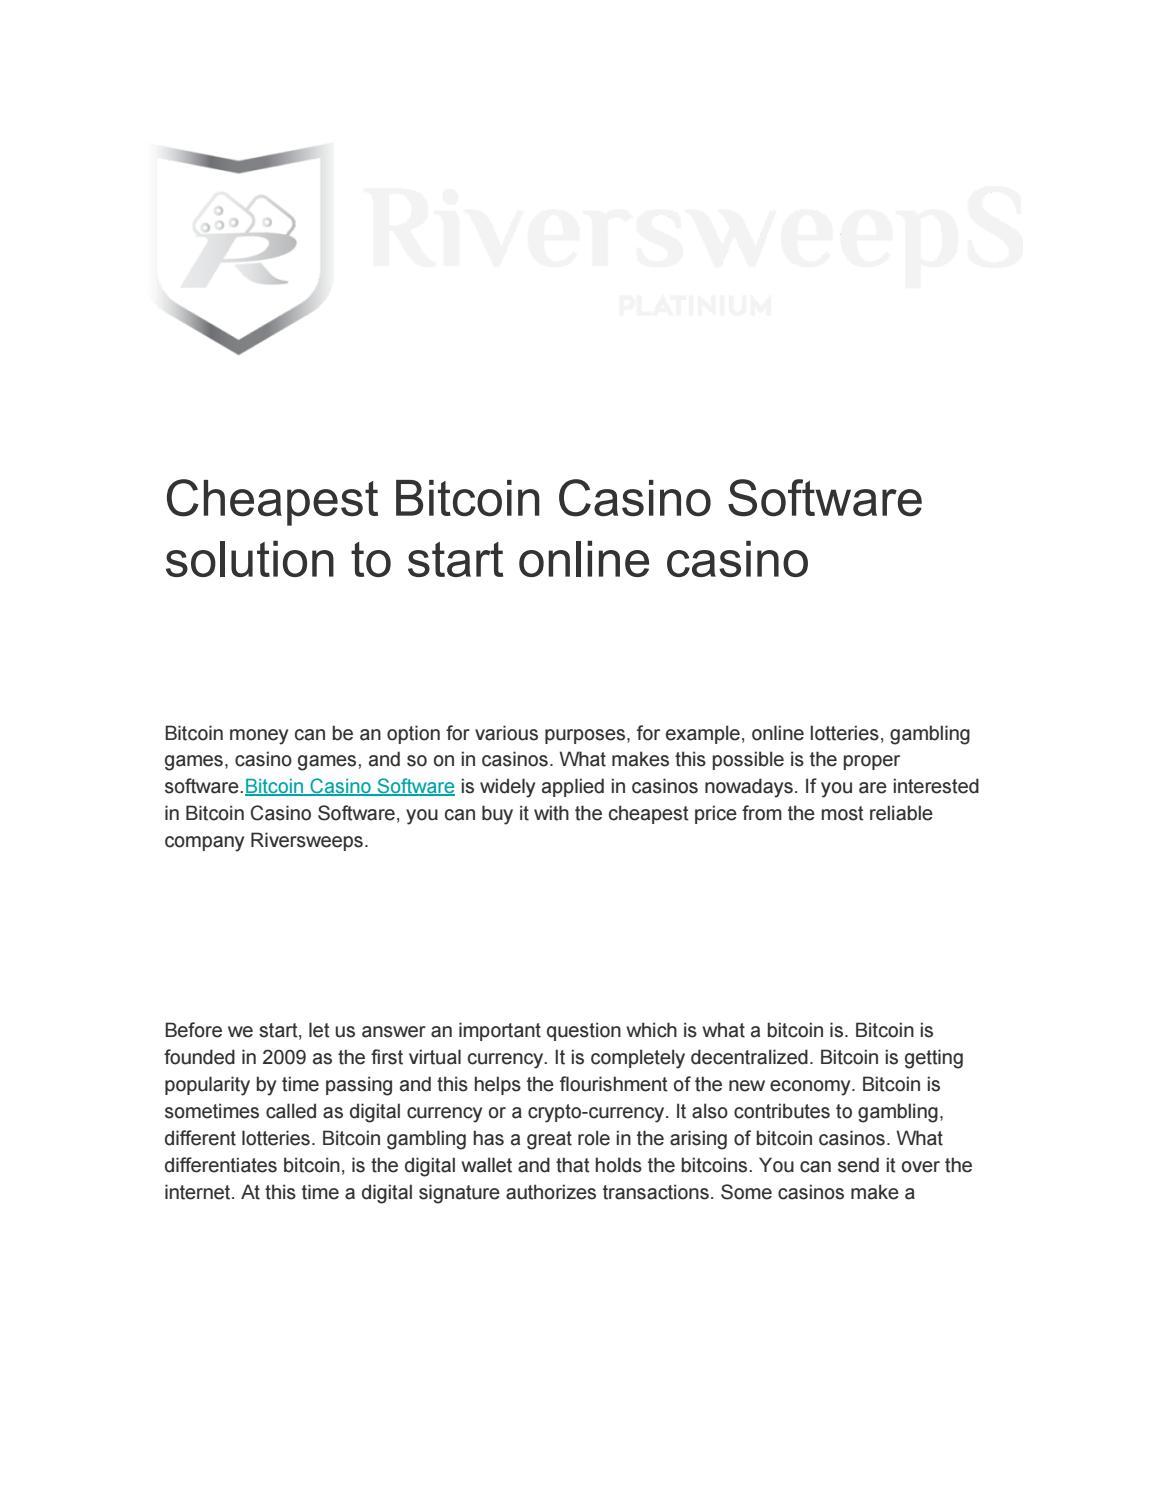 Cheapest Bitcoin Casino Software by lolwebzool - issuu